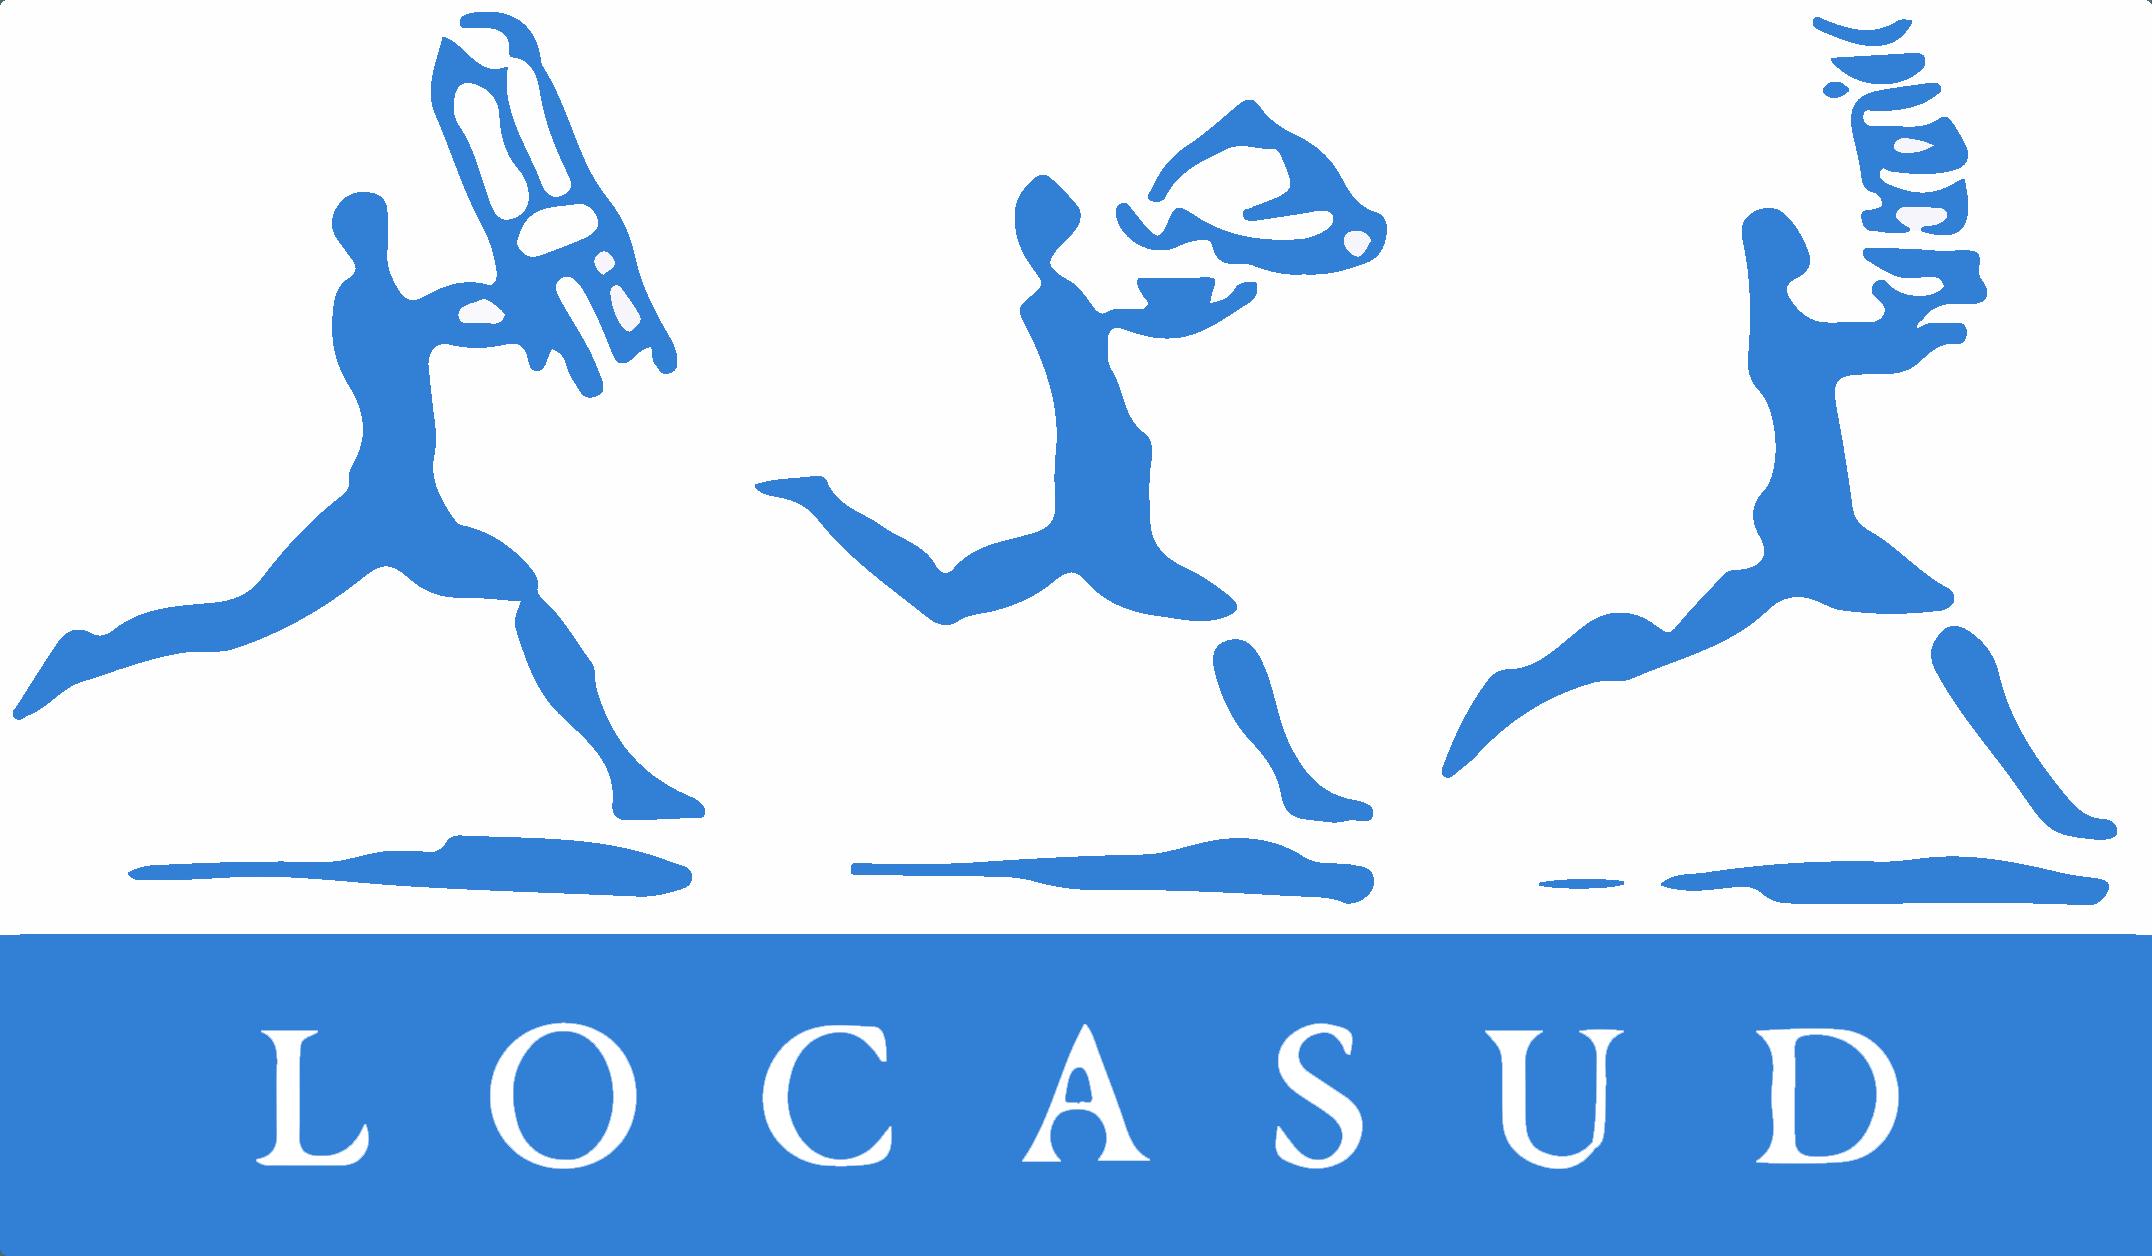 Locasud